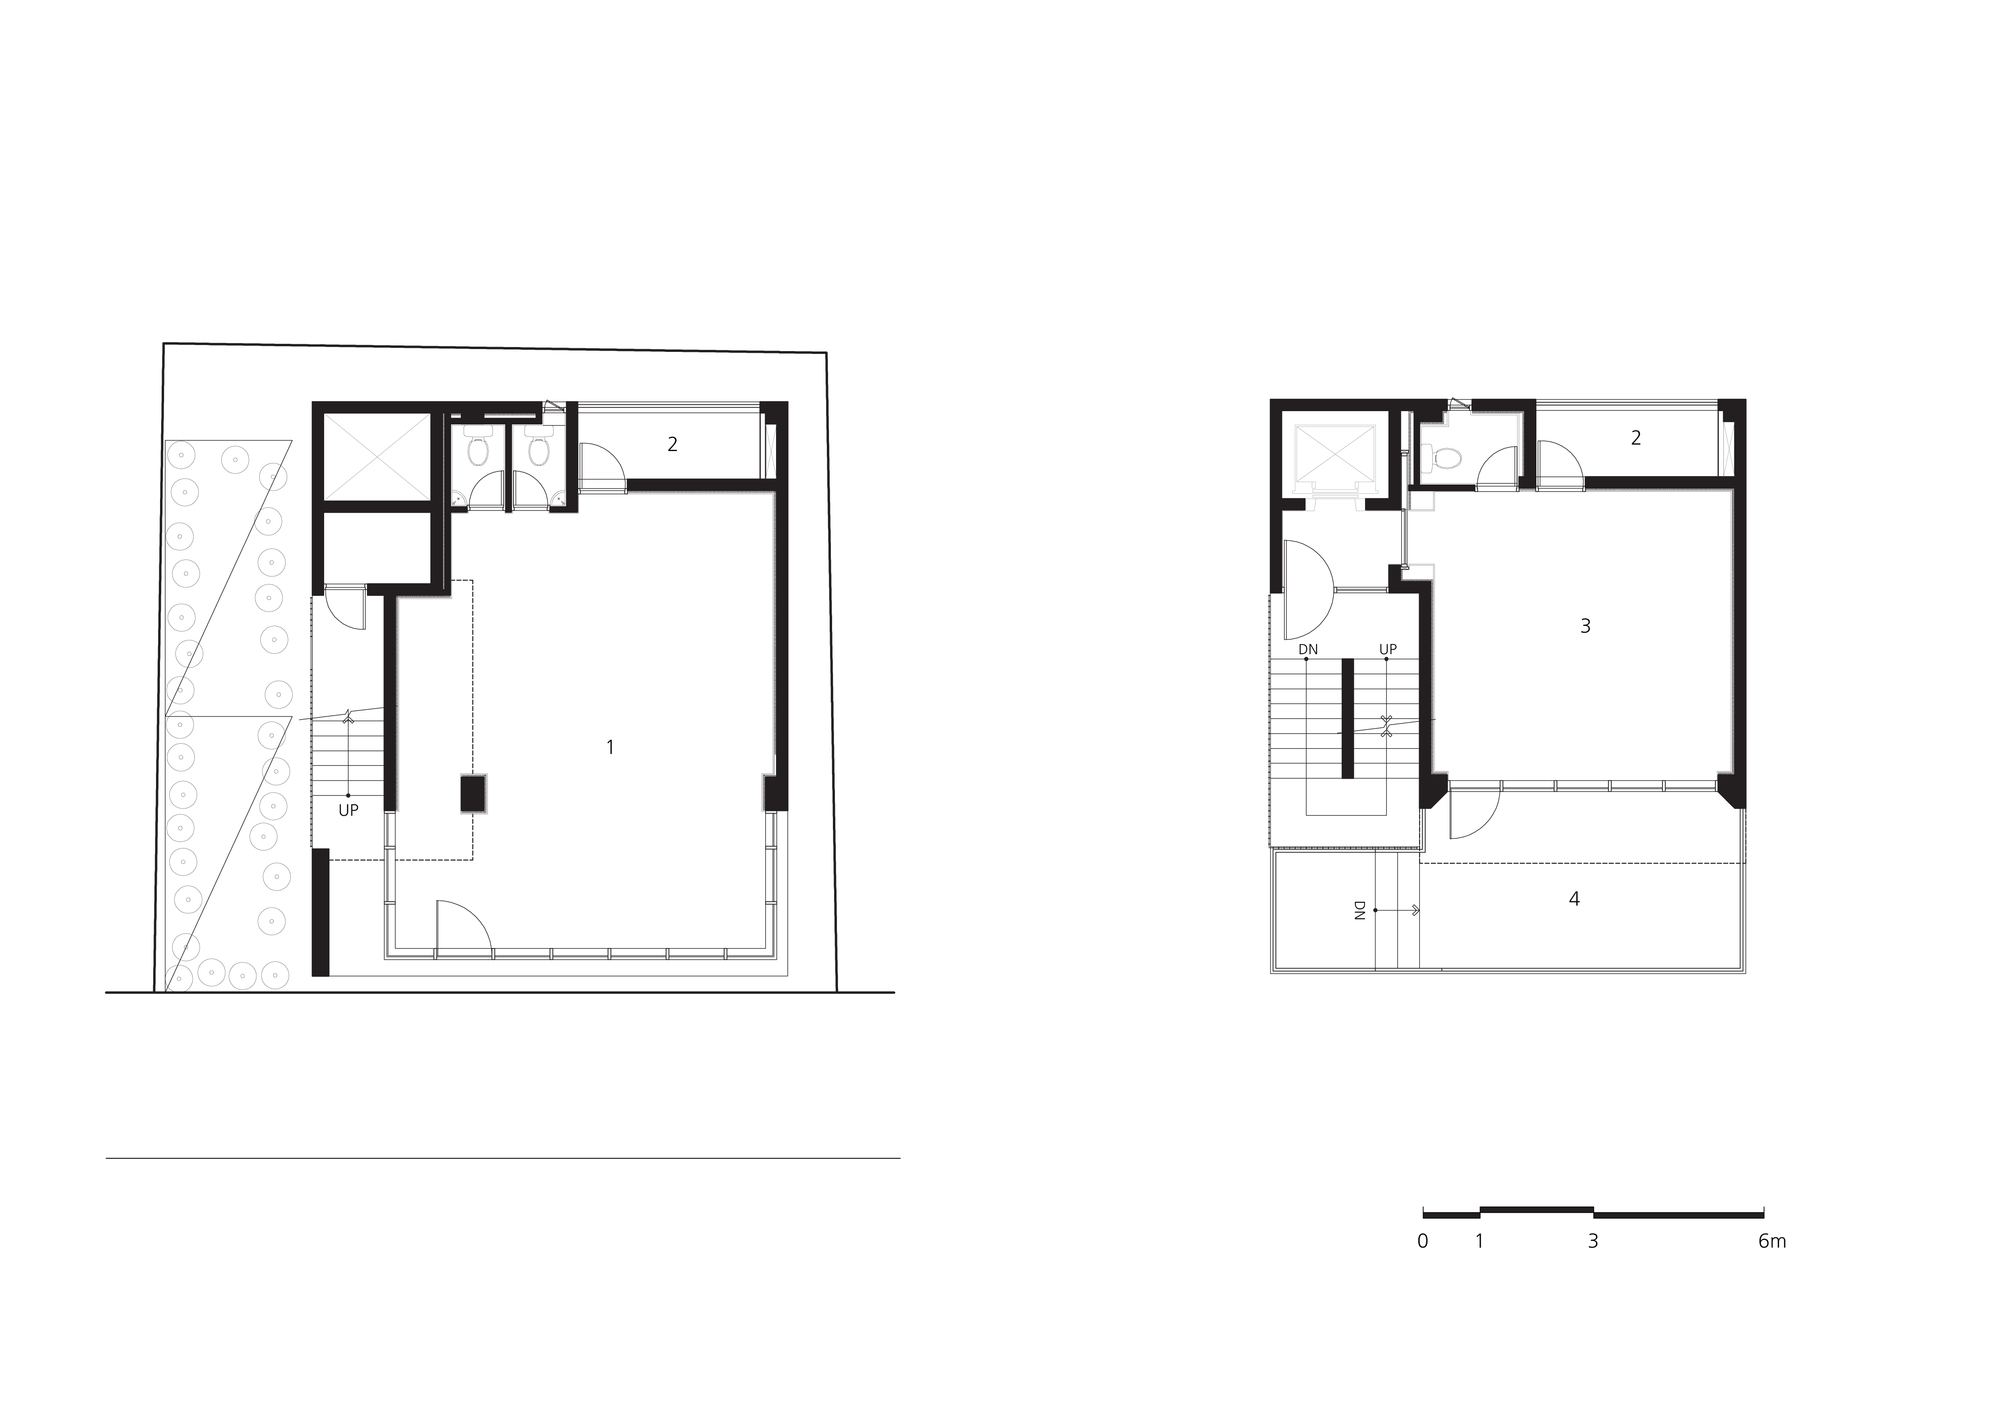 Gallery of Floor Area Ratio Game / ON